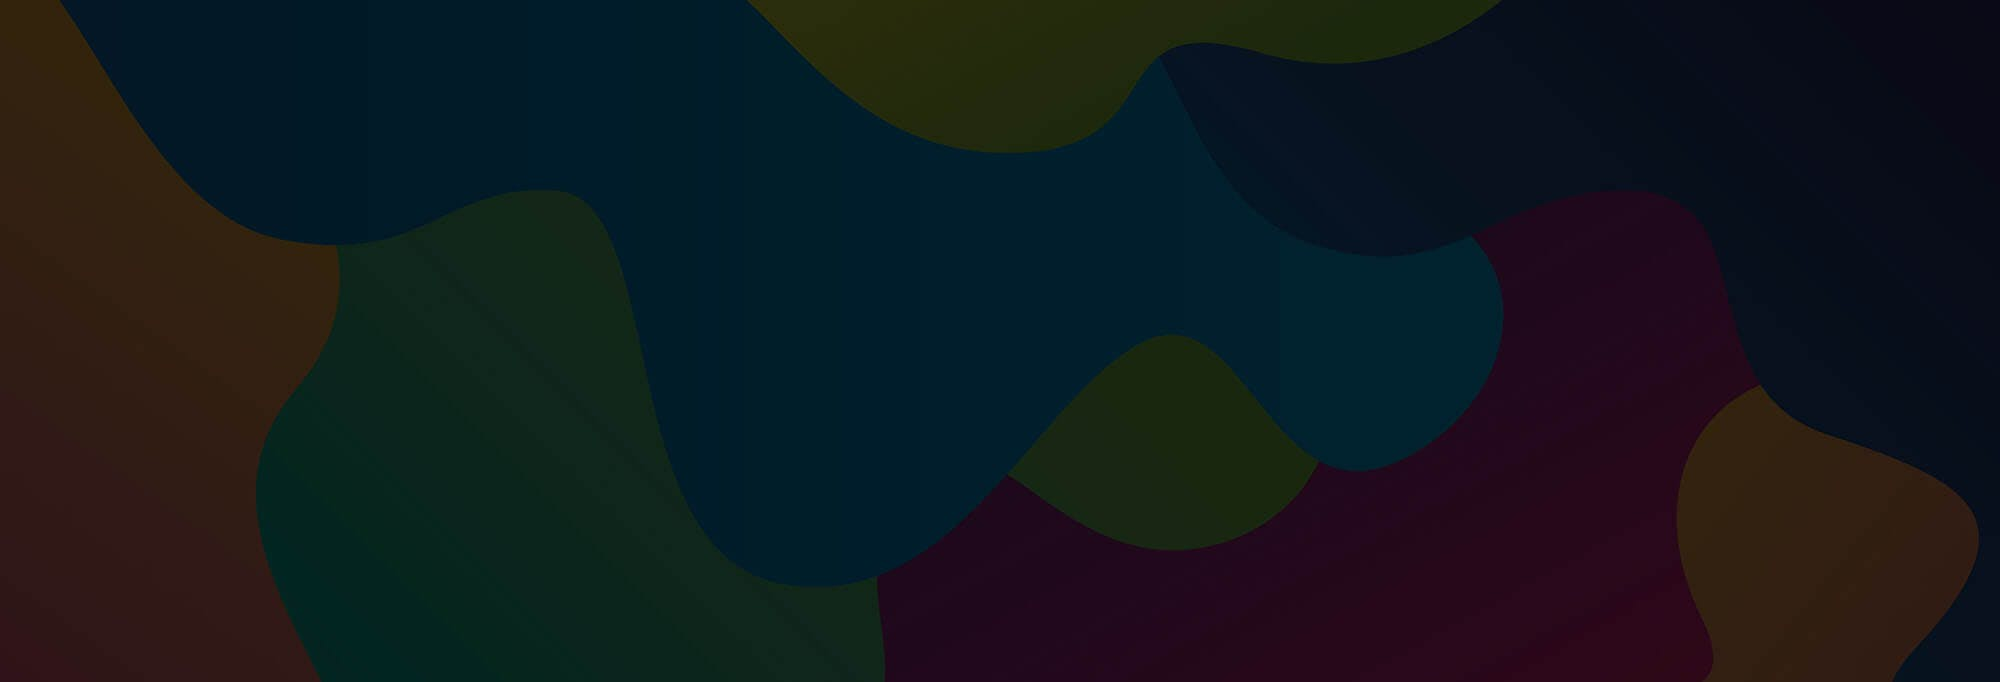 93% OFF | FL Studio Templates Pack